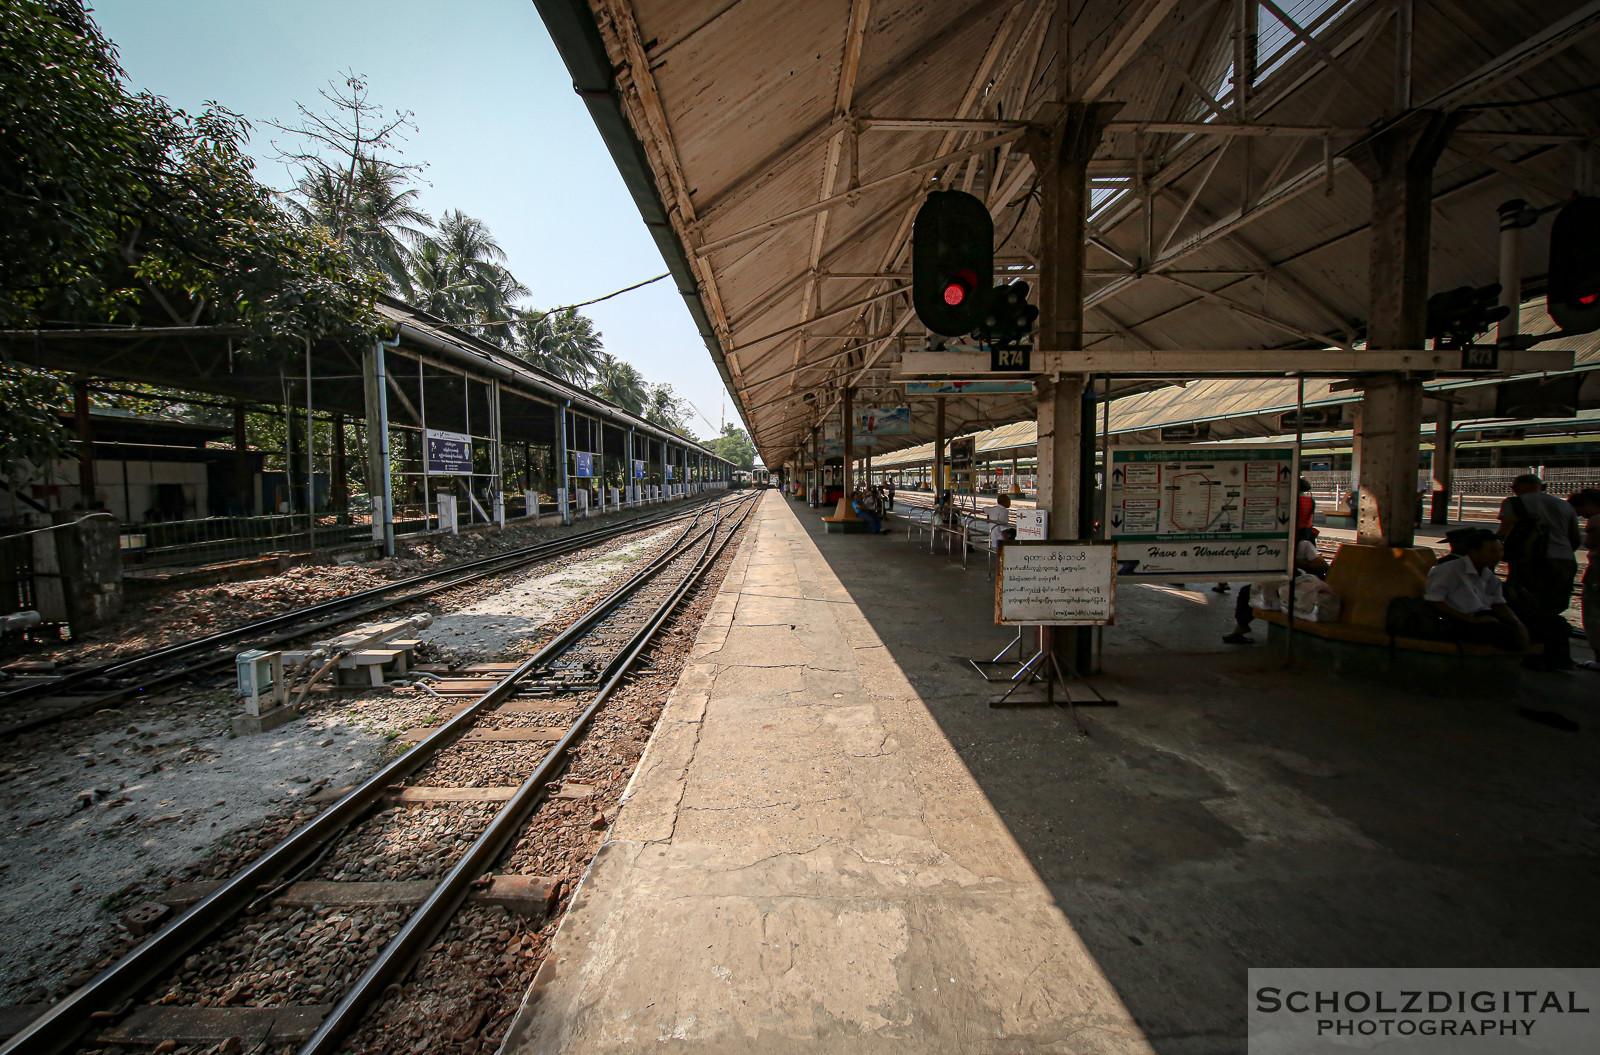 Exploring, Travelling, Myanmar, Birma, Burma, Streetphotography, Travelling, Wanderlust, Southeastasia, asia, travel, globetrotter, travelphotography, Yangon Circular Railway, Ringbahn, Rangun